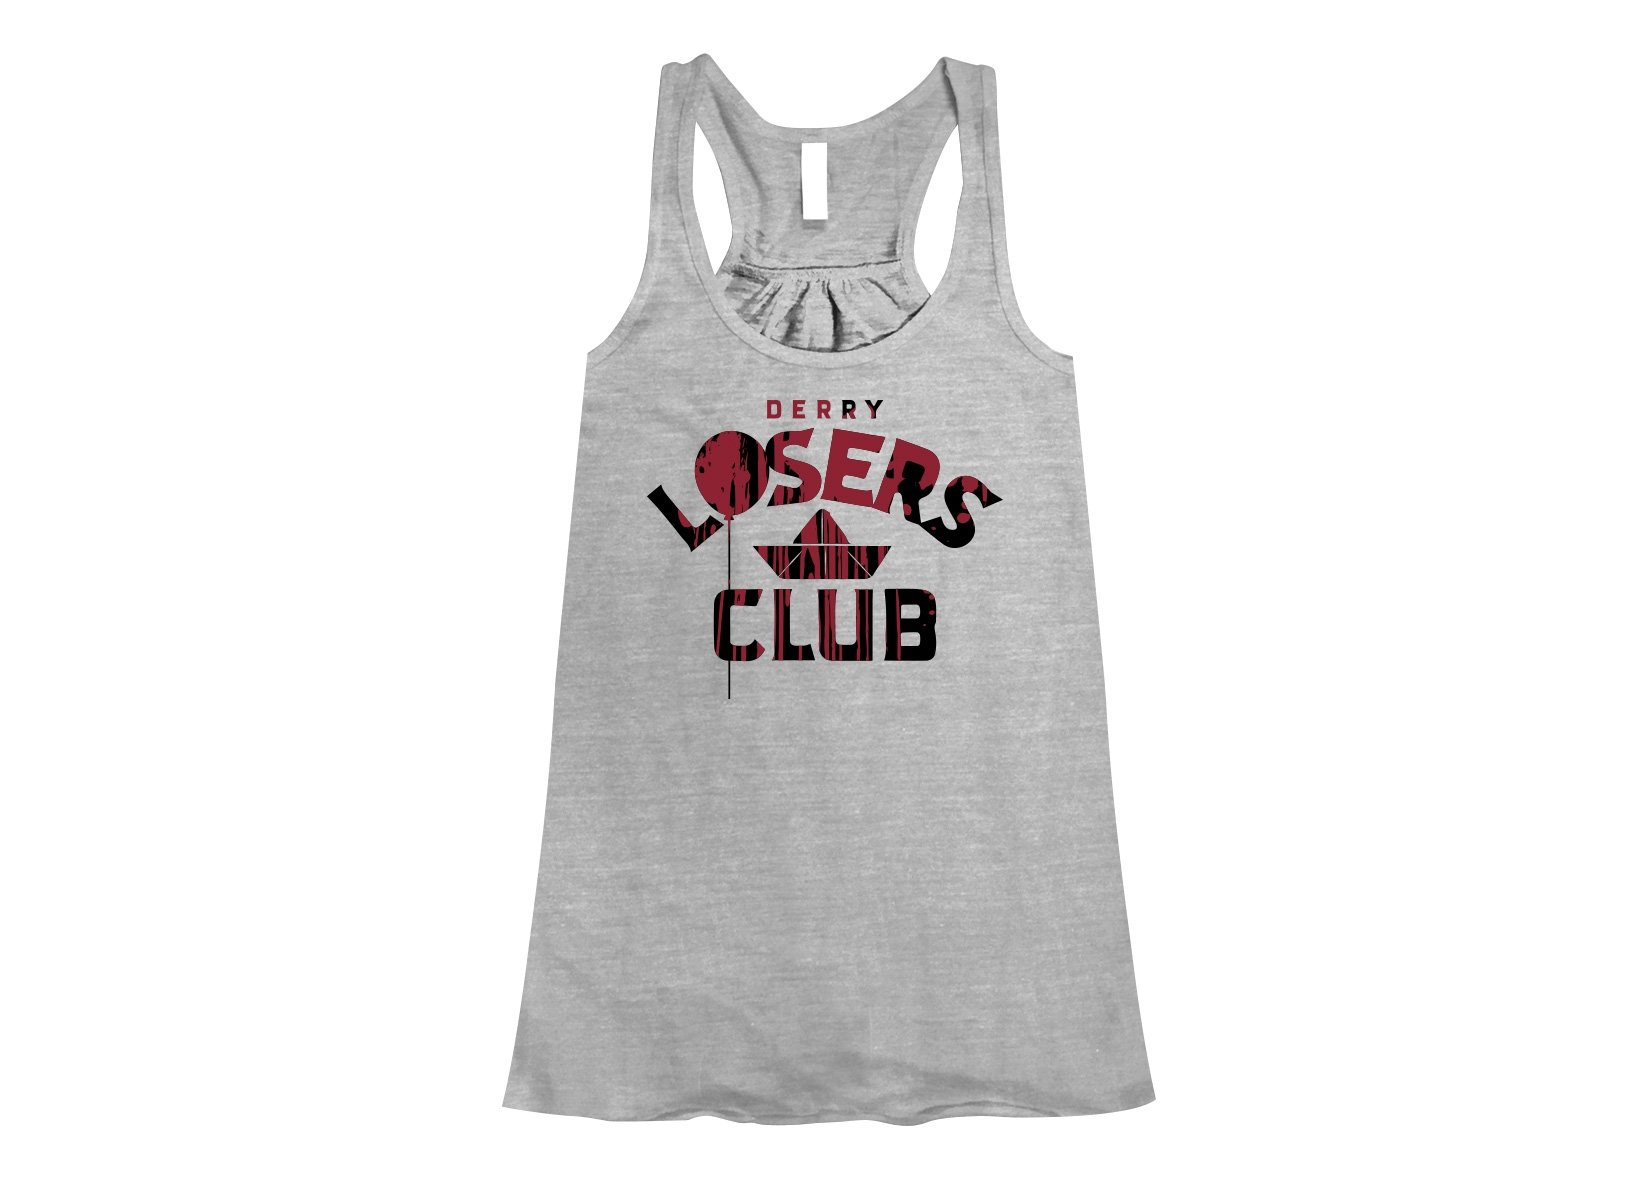 Derry Losers Club on Womens Tanks T-Shirt